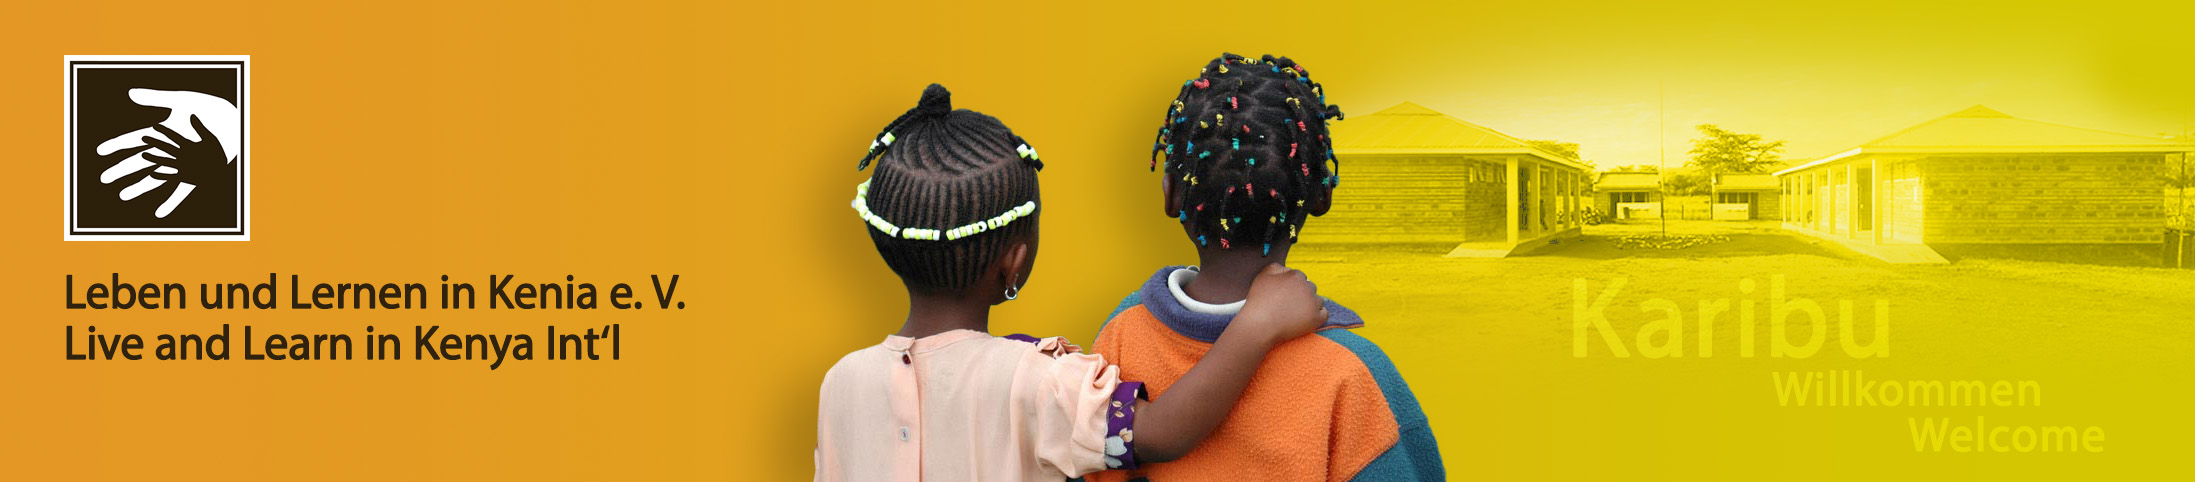 Leben und Lernen in Kenia e. V.